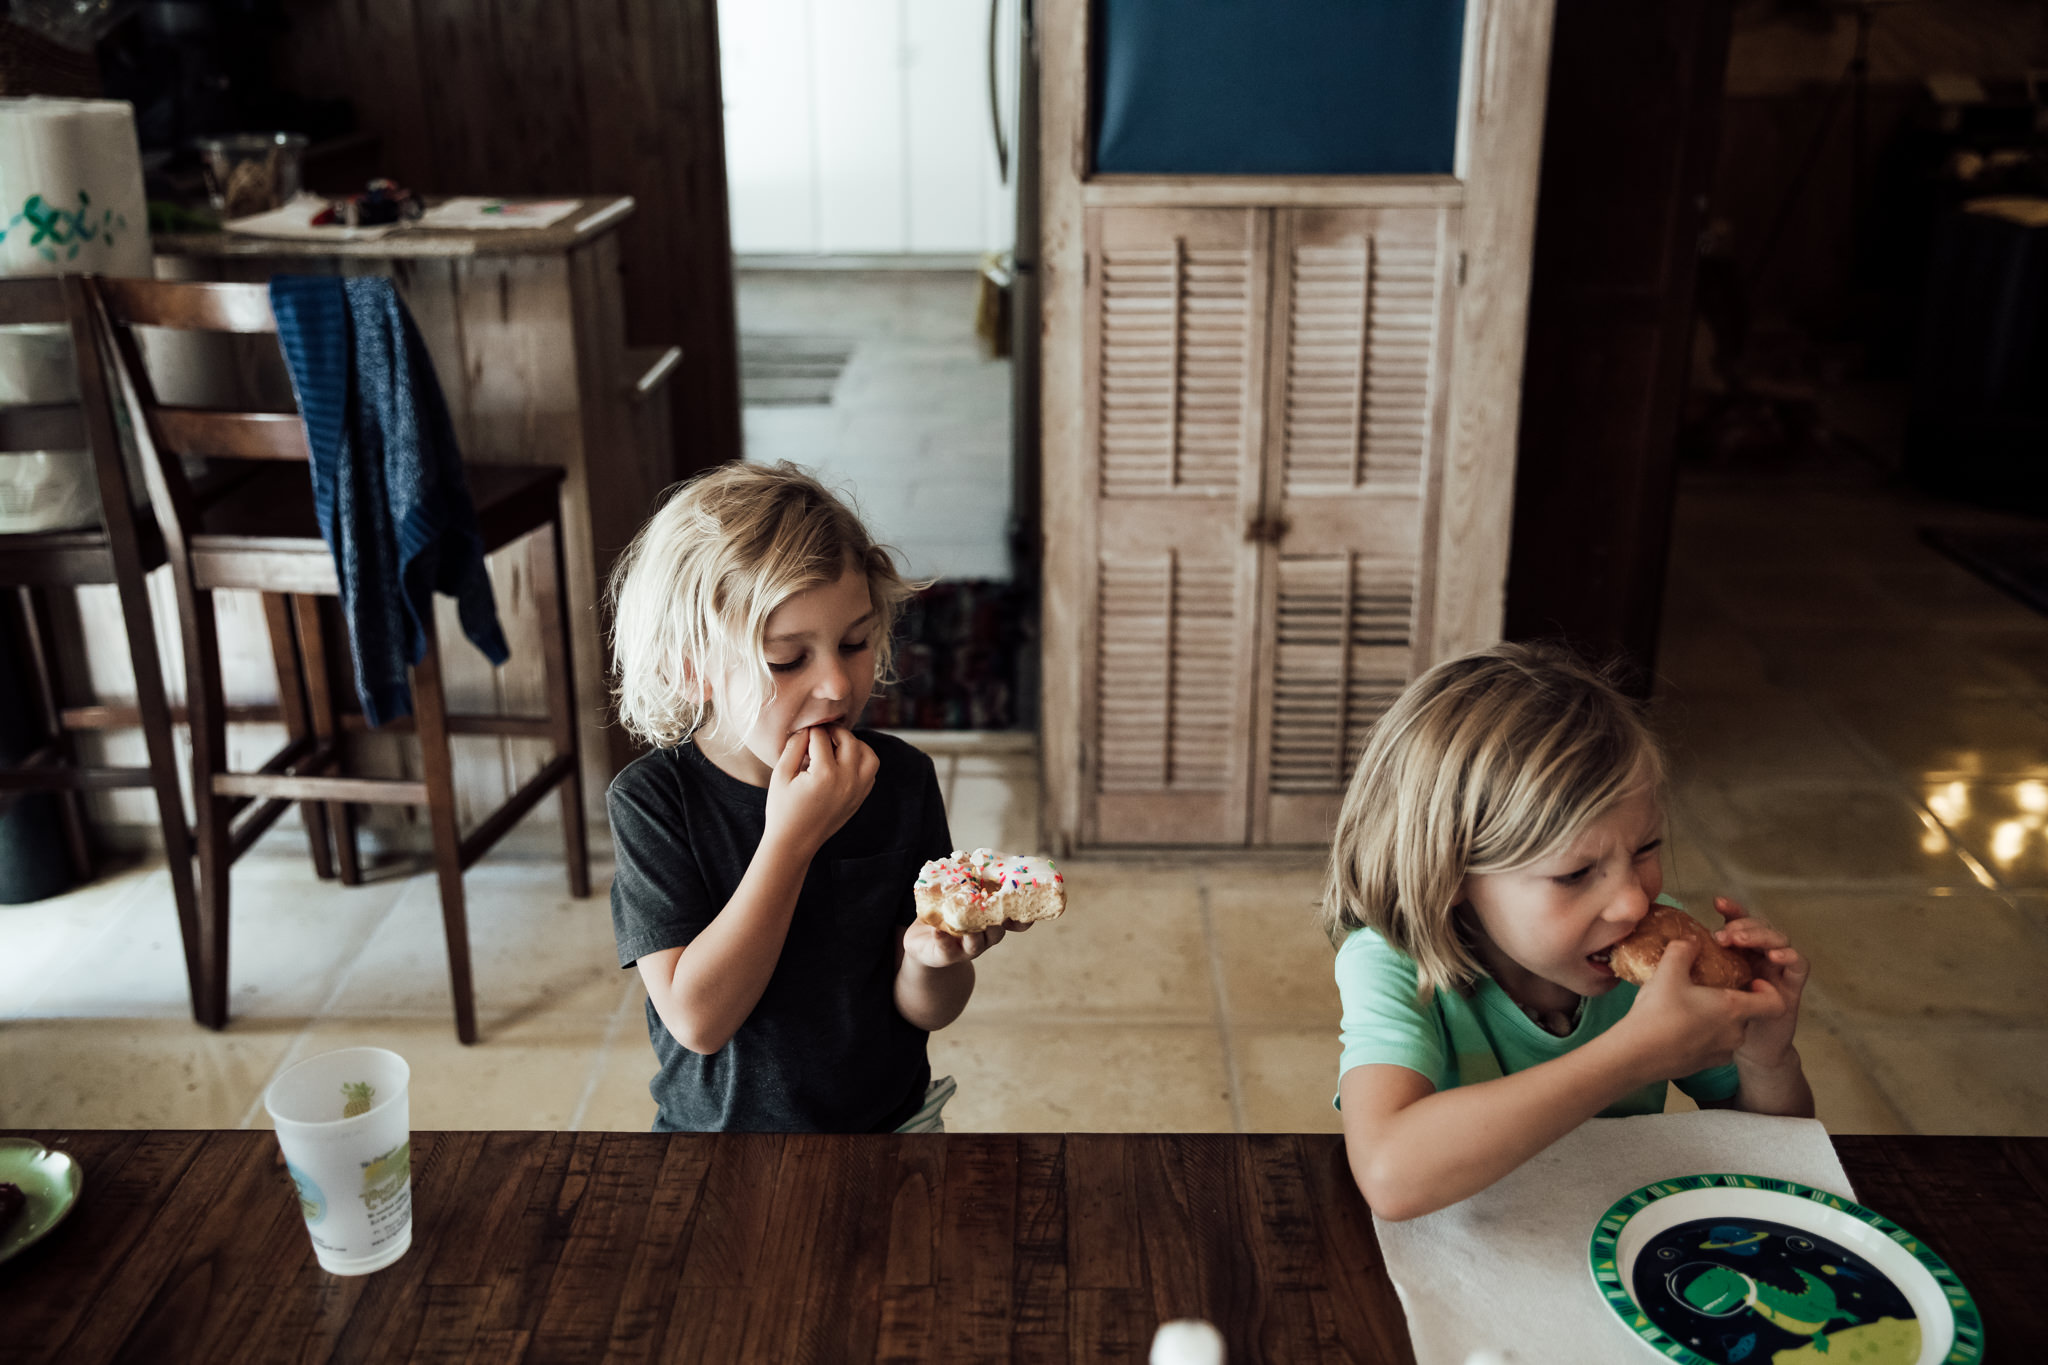 birth-photography-documentary-family-photographer-4.jpg